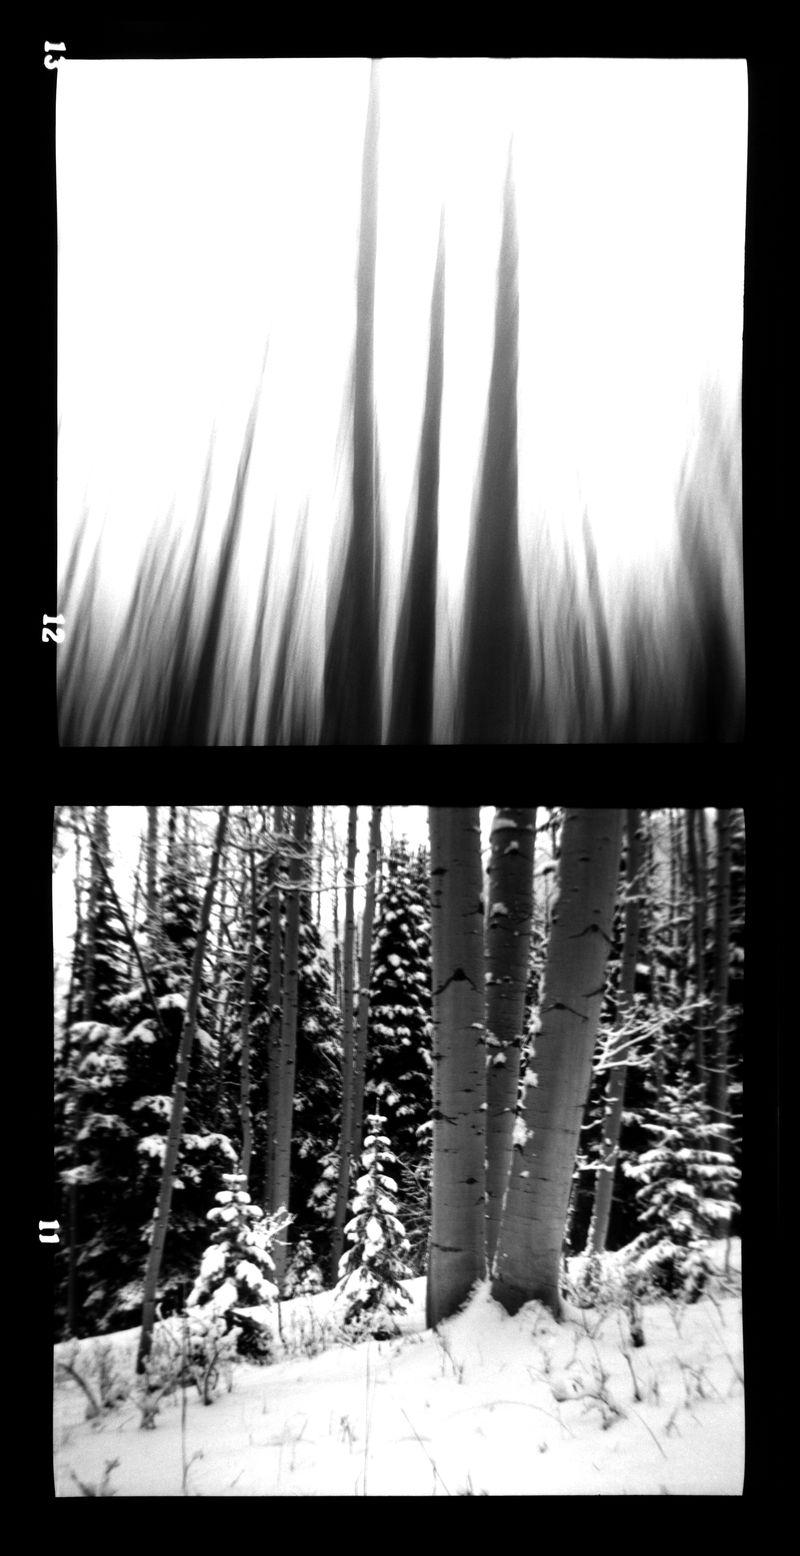 Snow-Aspens-Ascending-#15